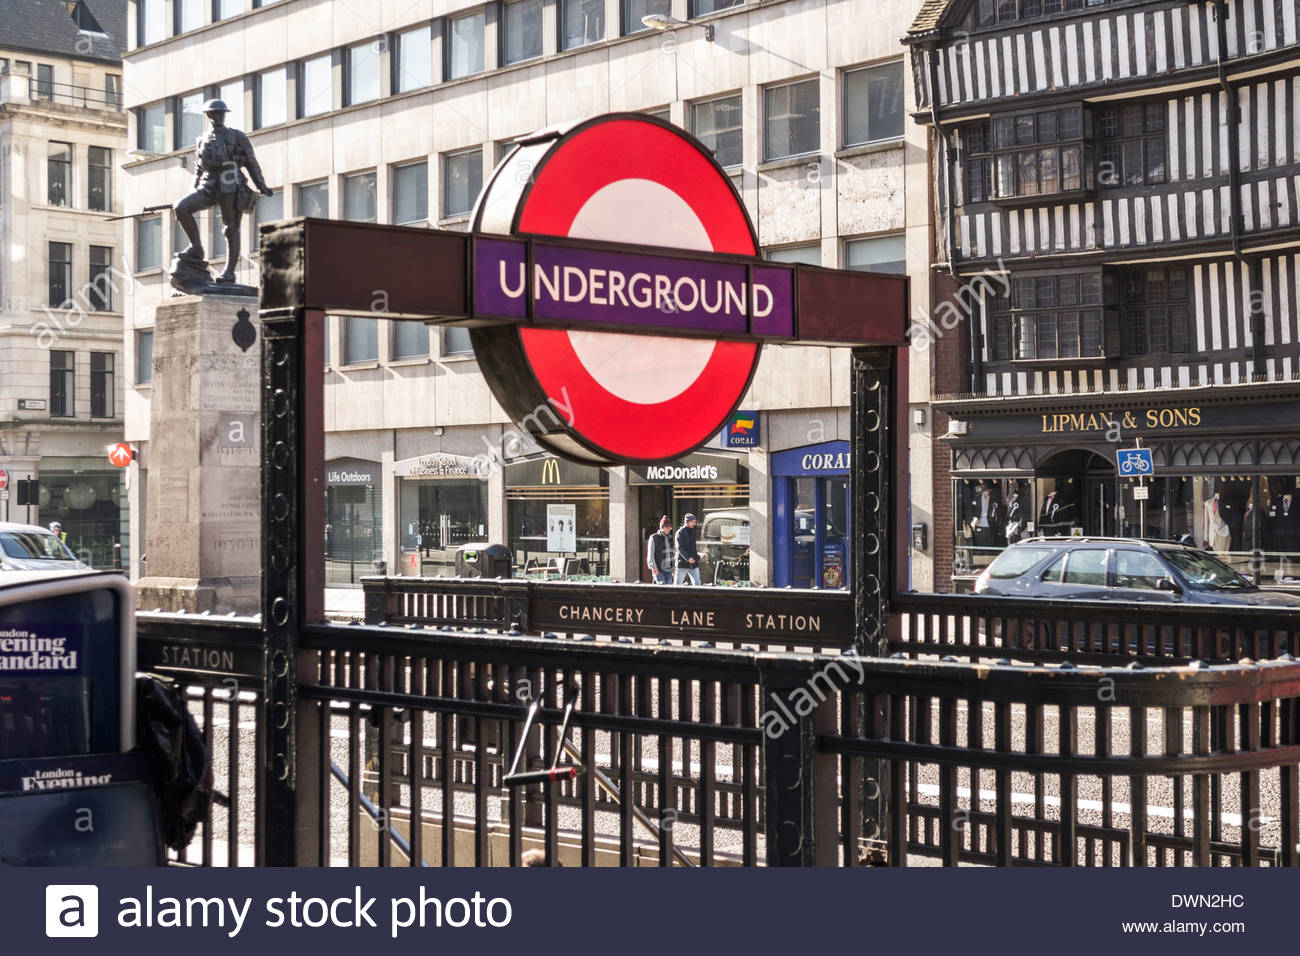 Chancery Lane underground station and sign - Stock Image